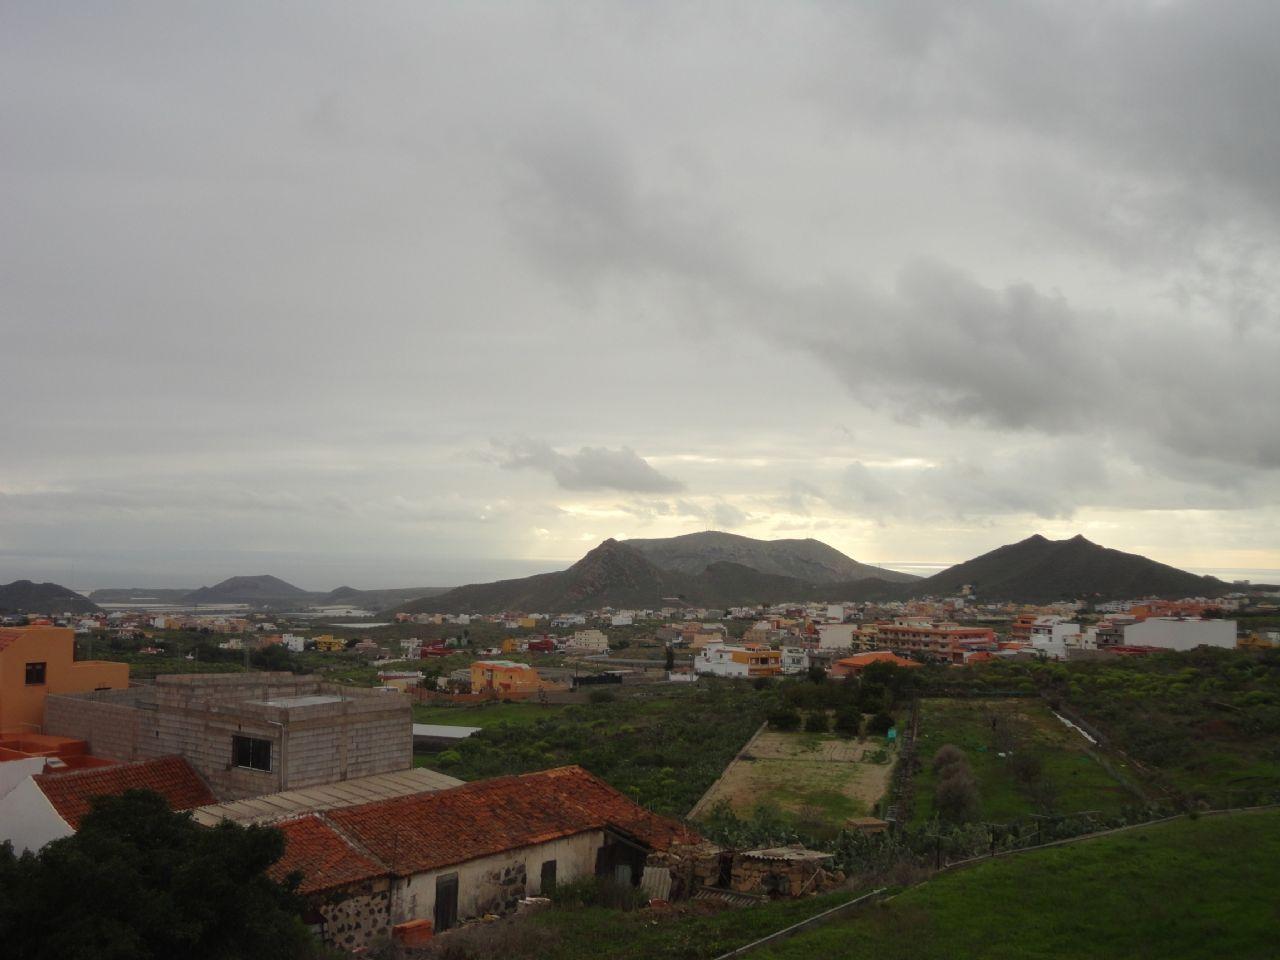 Сельский дом в Ароне (Тенерифе)